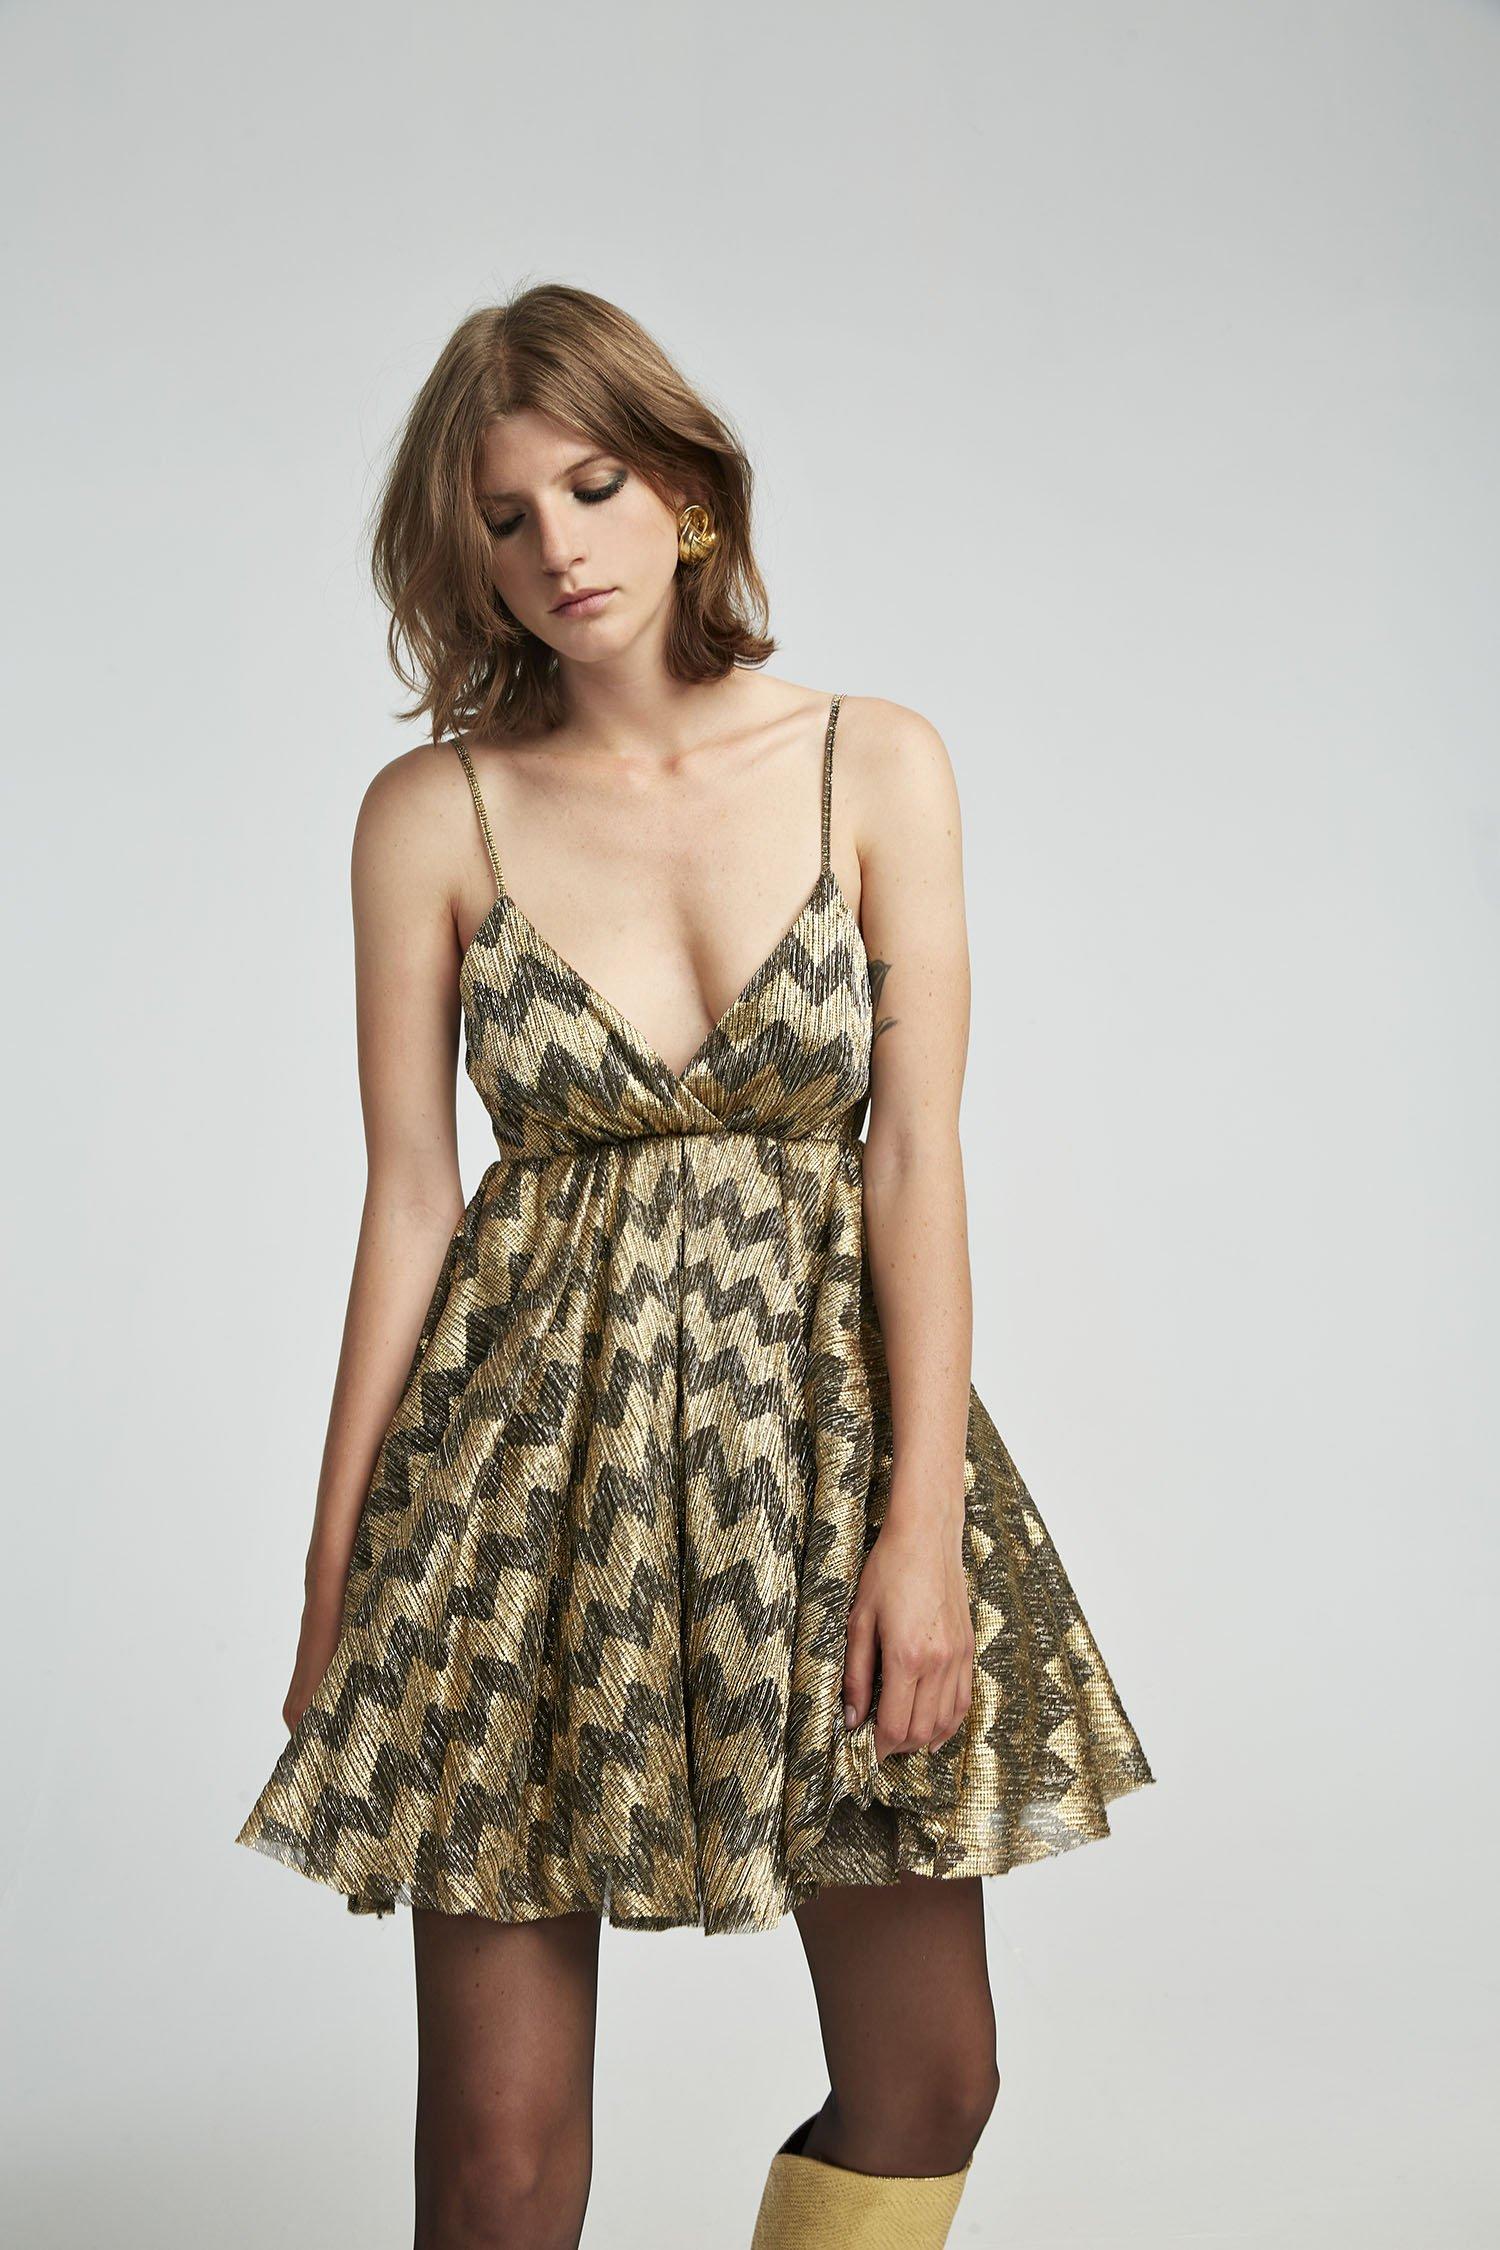 KURT DRESS